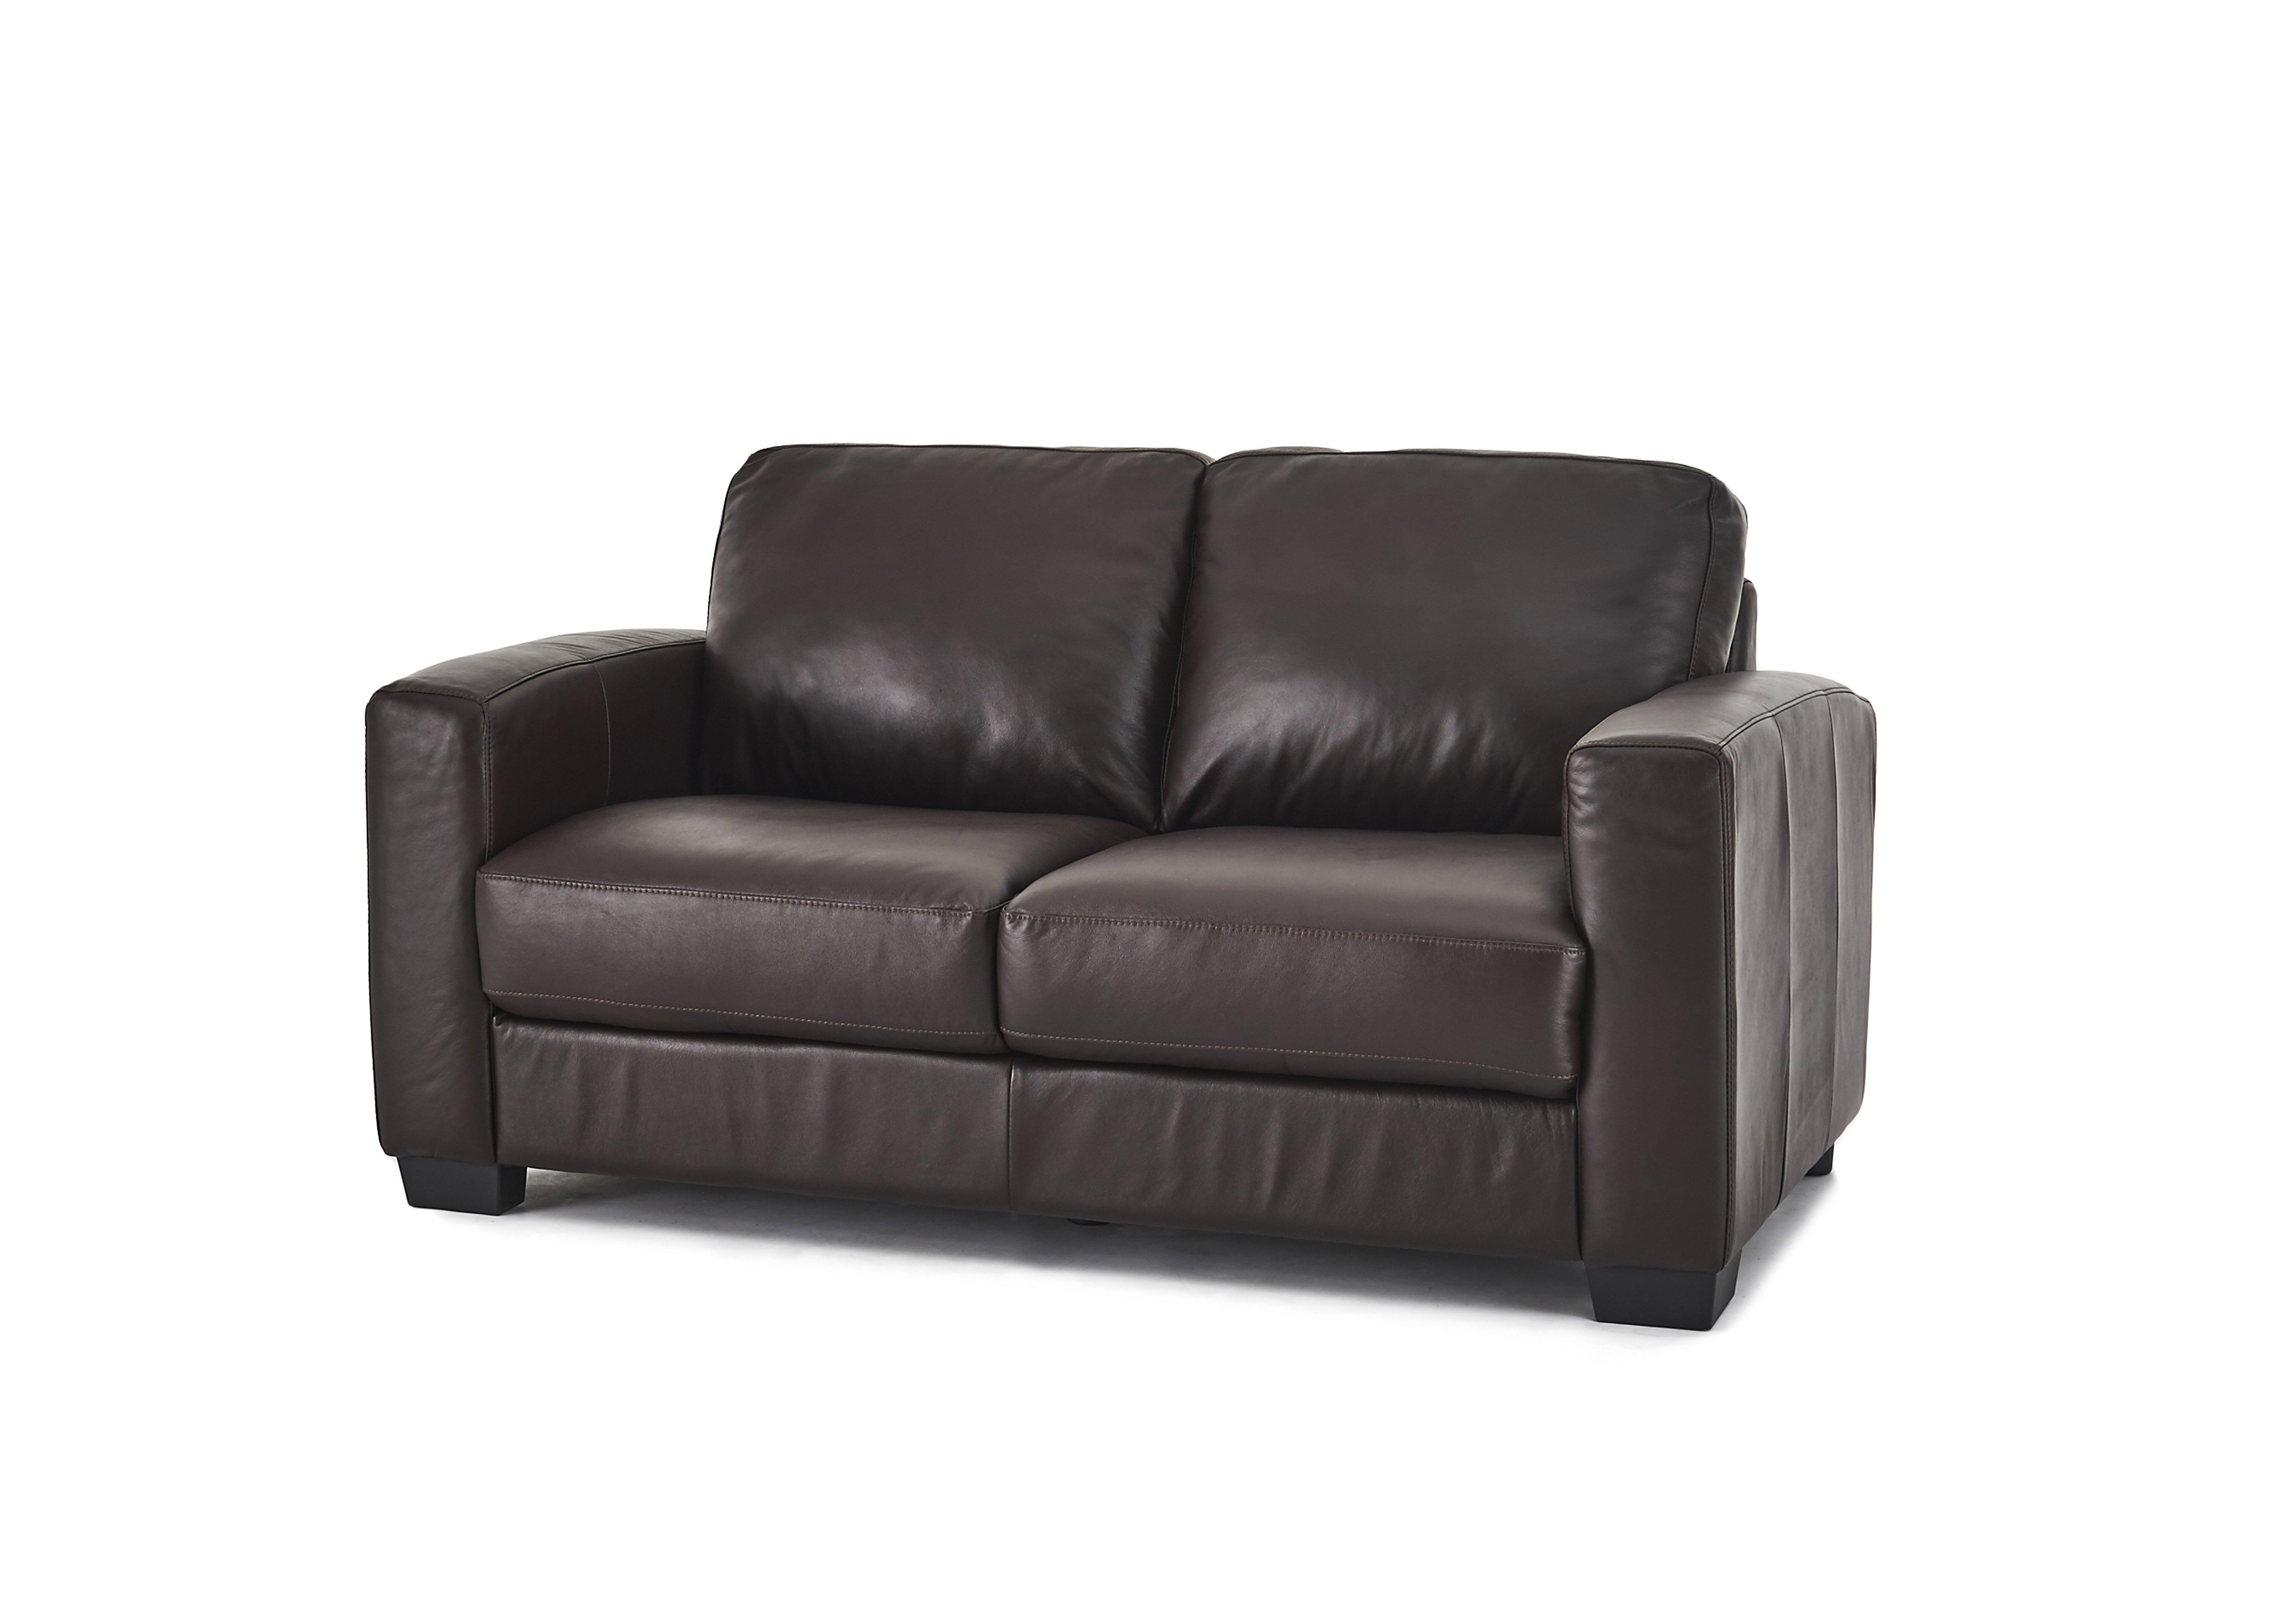 Dante 2 Seater Leather Sofa Furniture Village ~ Black Leather Sofa Chair